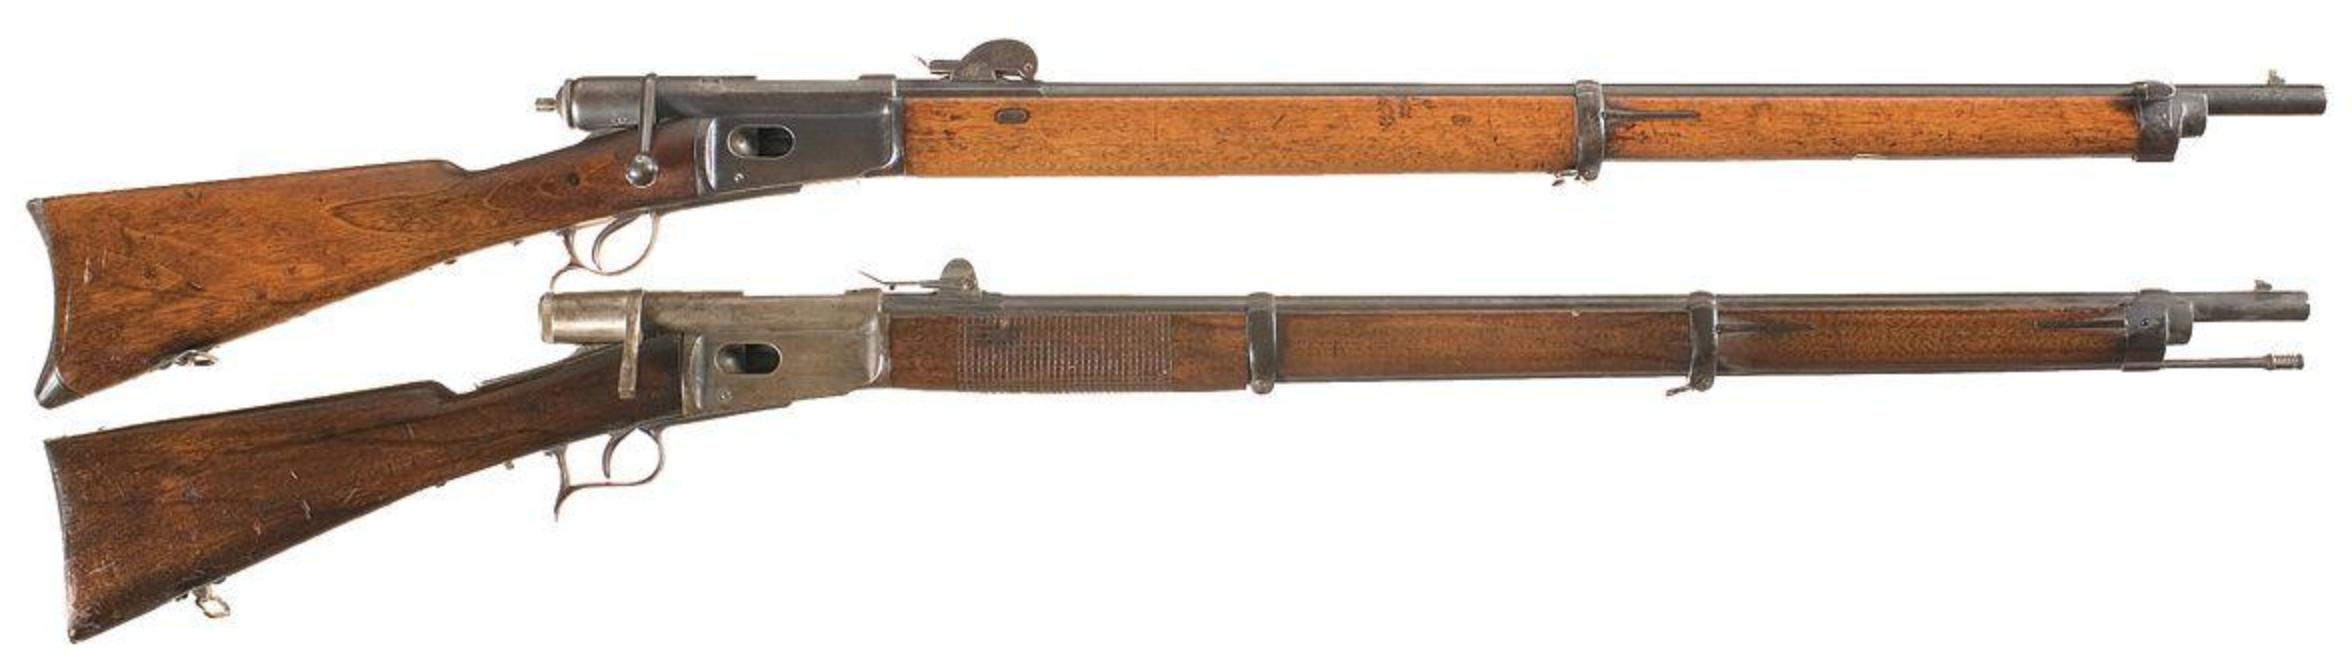 Vetterli rifle